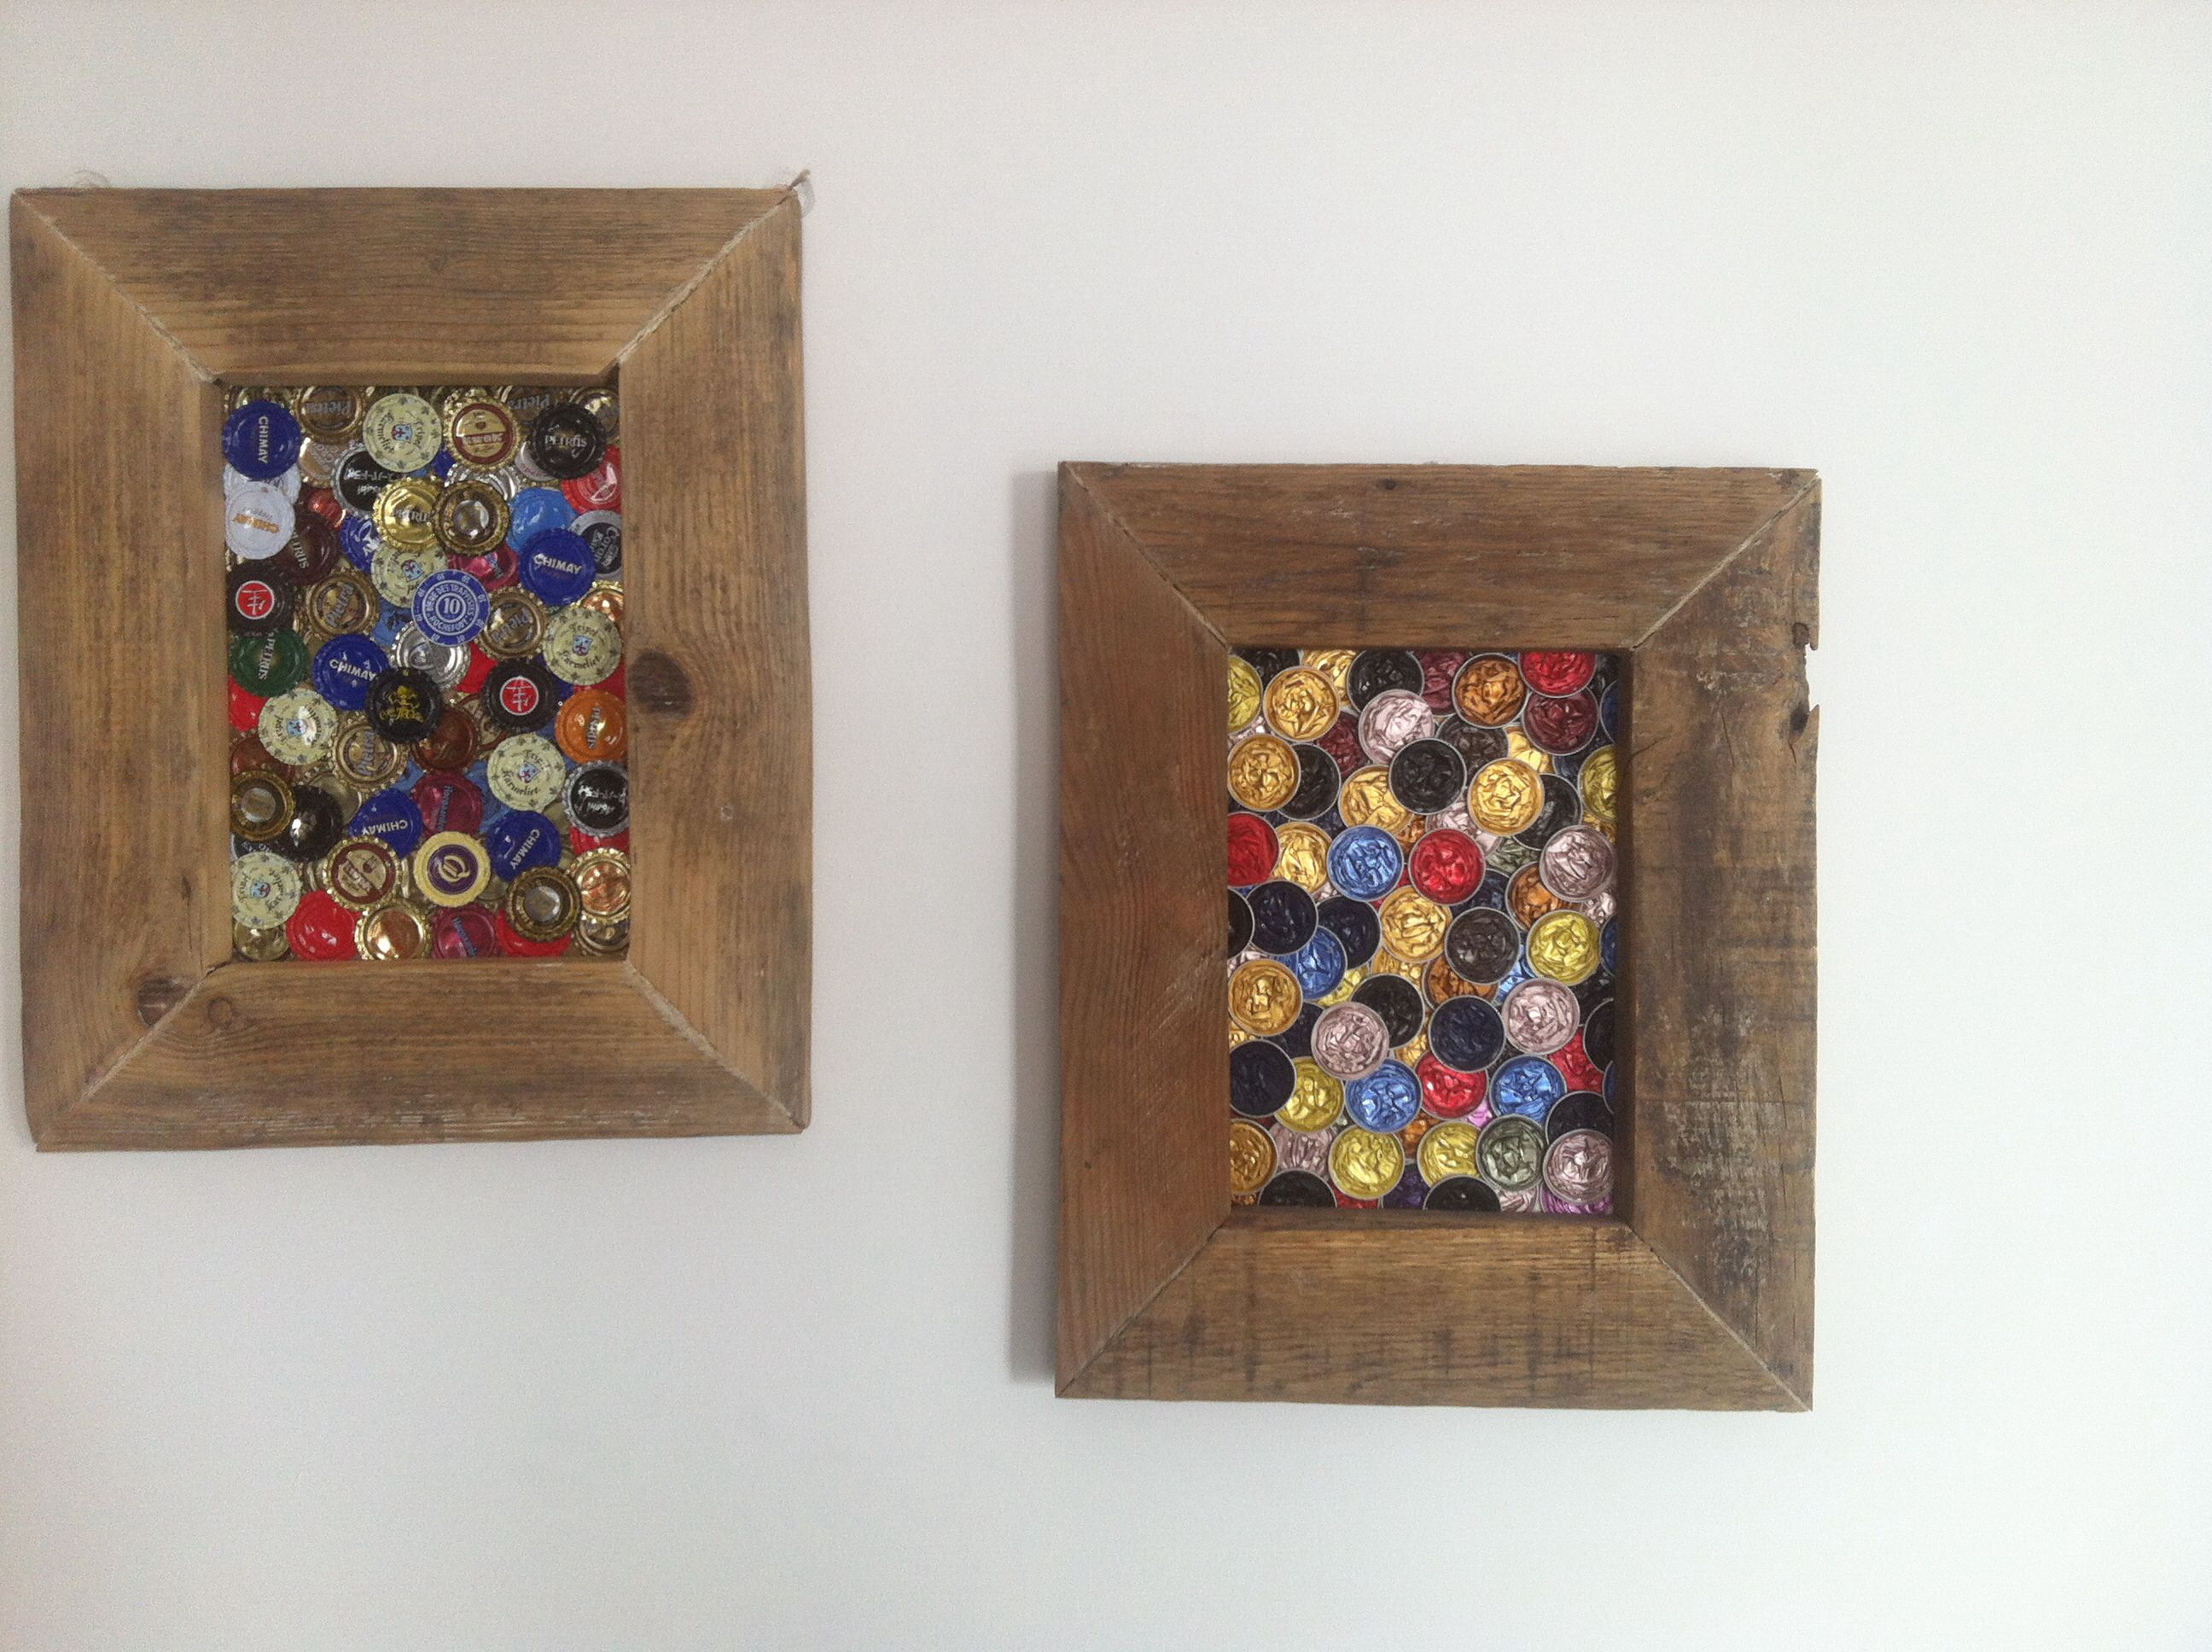 Diy tableau capsule nespresso et bi re manualidades crafts bijoux handwerk - Capsule de biere deco ...